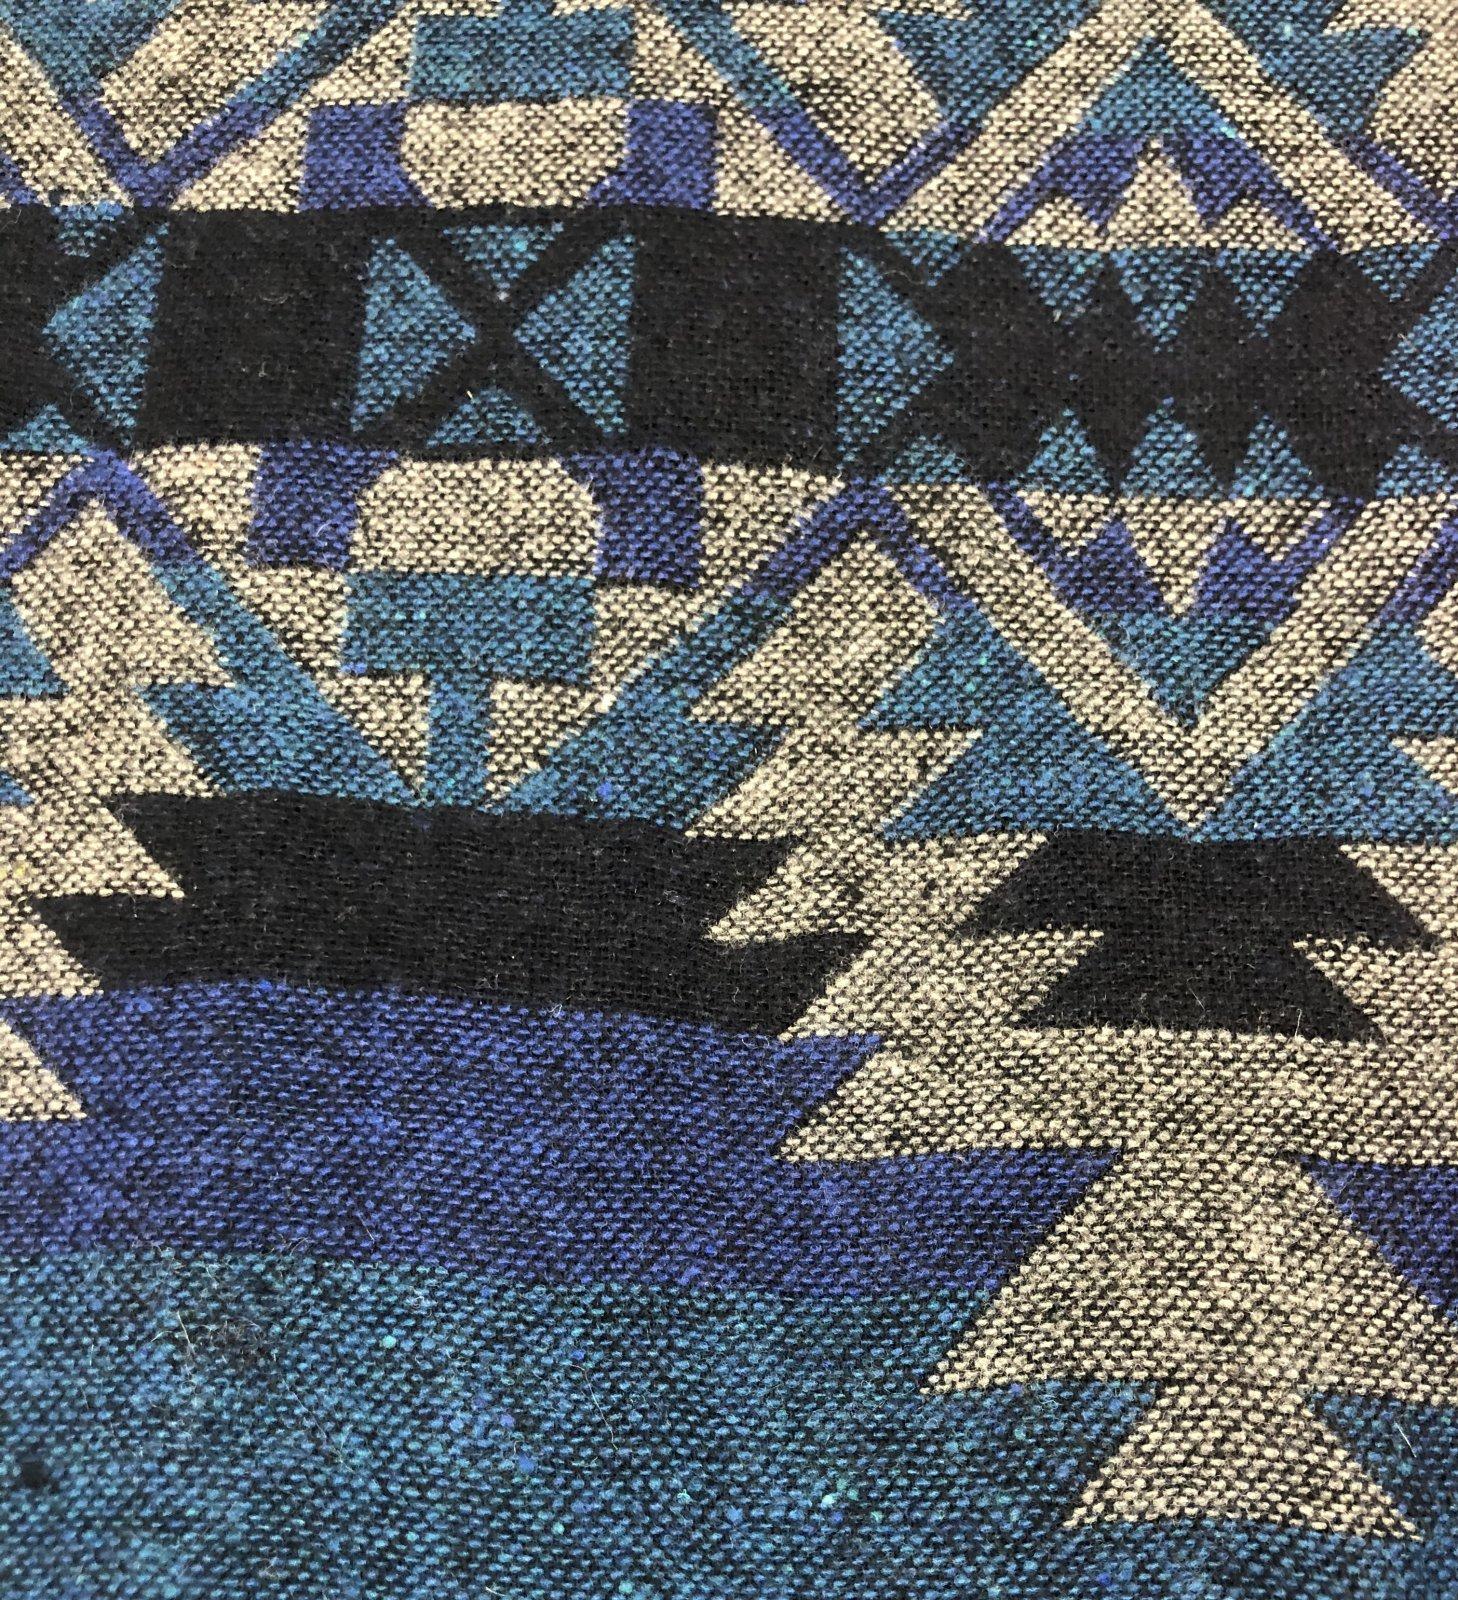 Siltex Wool Blend Jacquard Blue/Teal/Grey